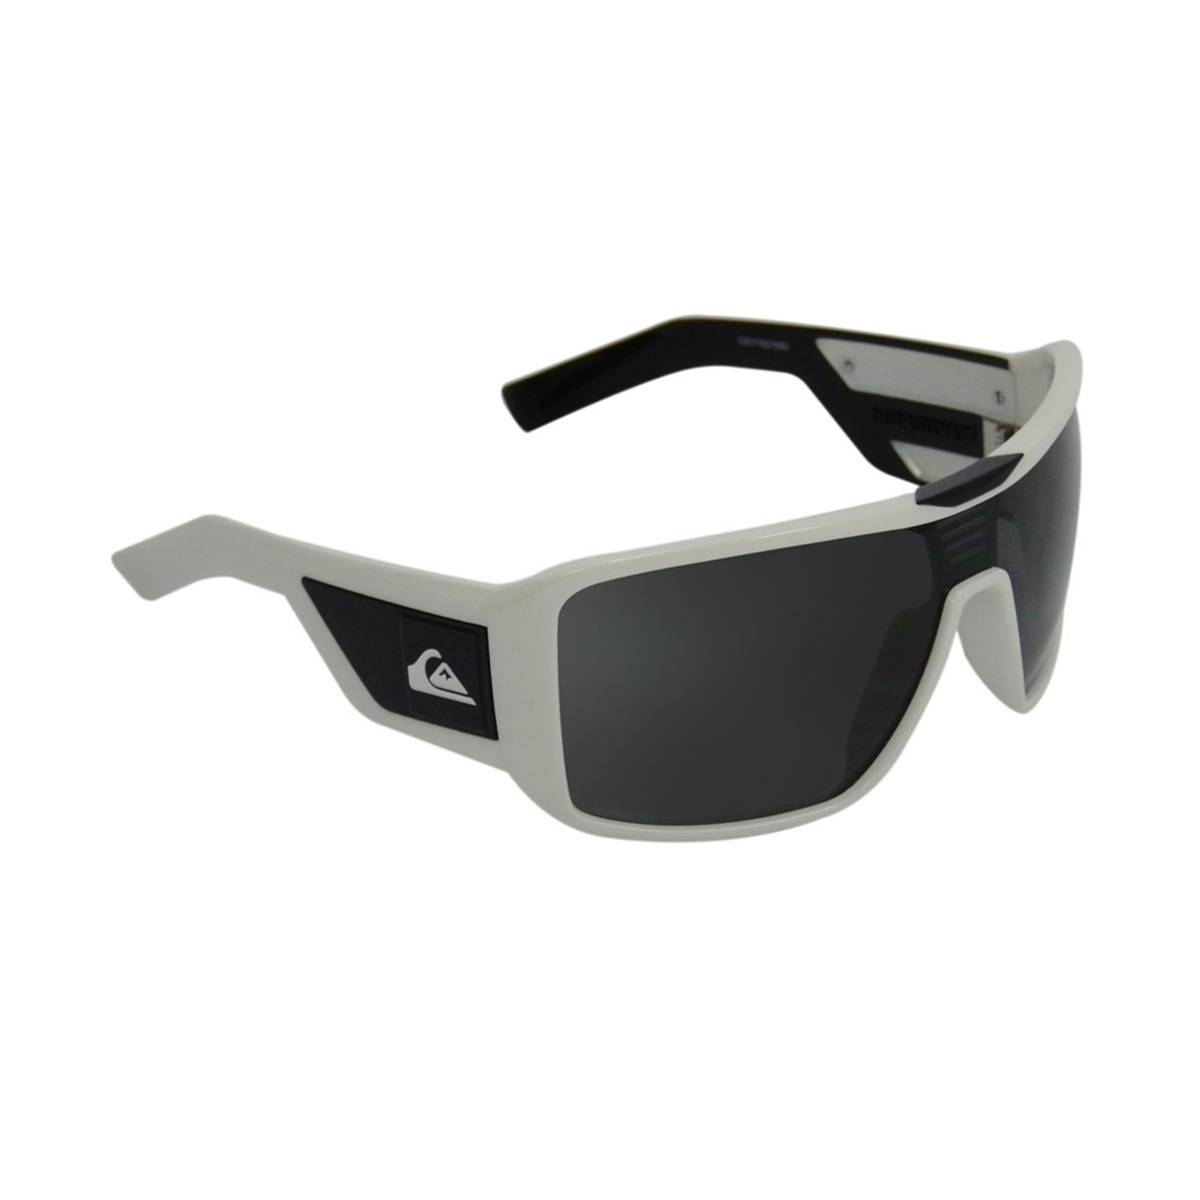 5d252cc8f6da3 óculos masculino quiksilver mackin black white. Carregando zoom.